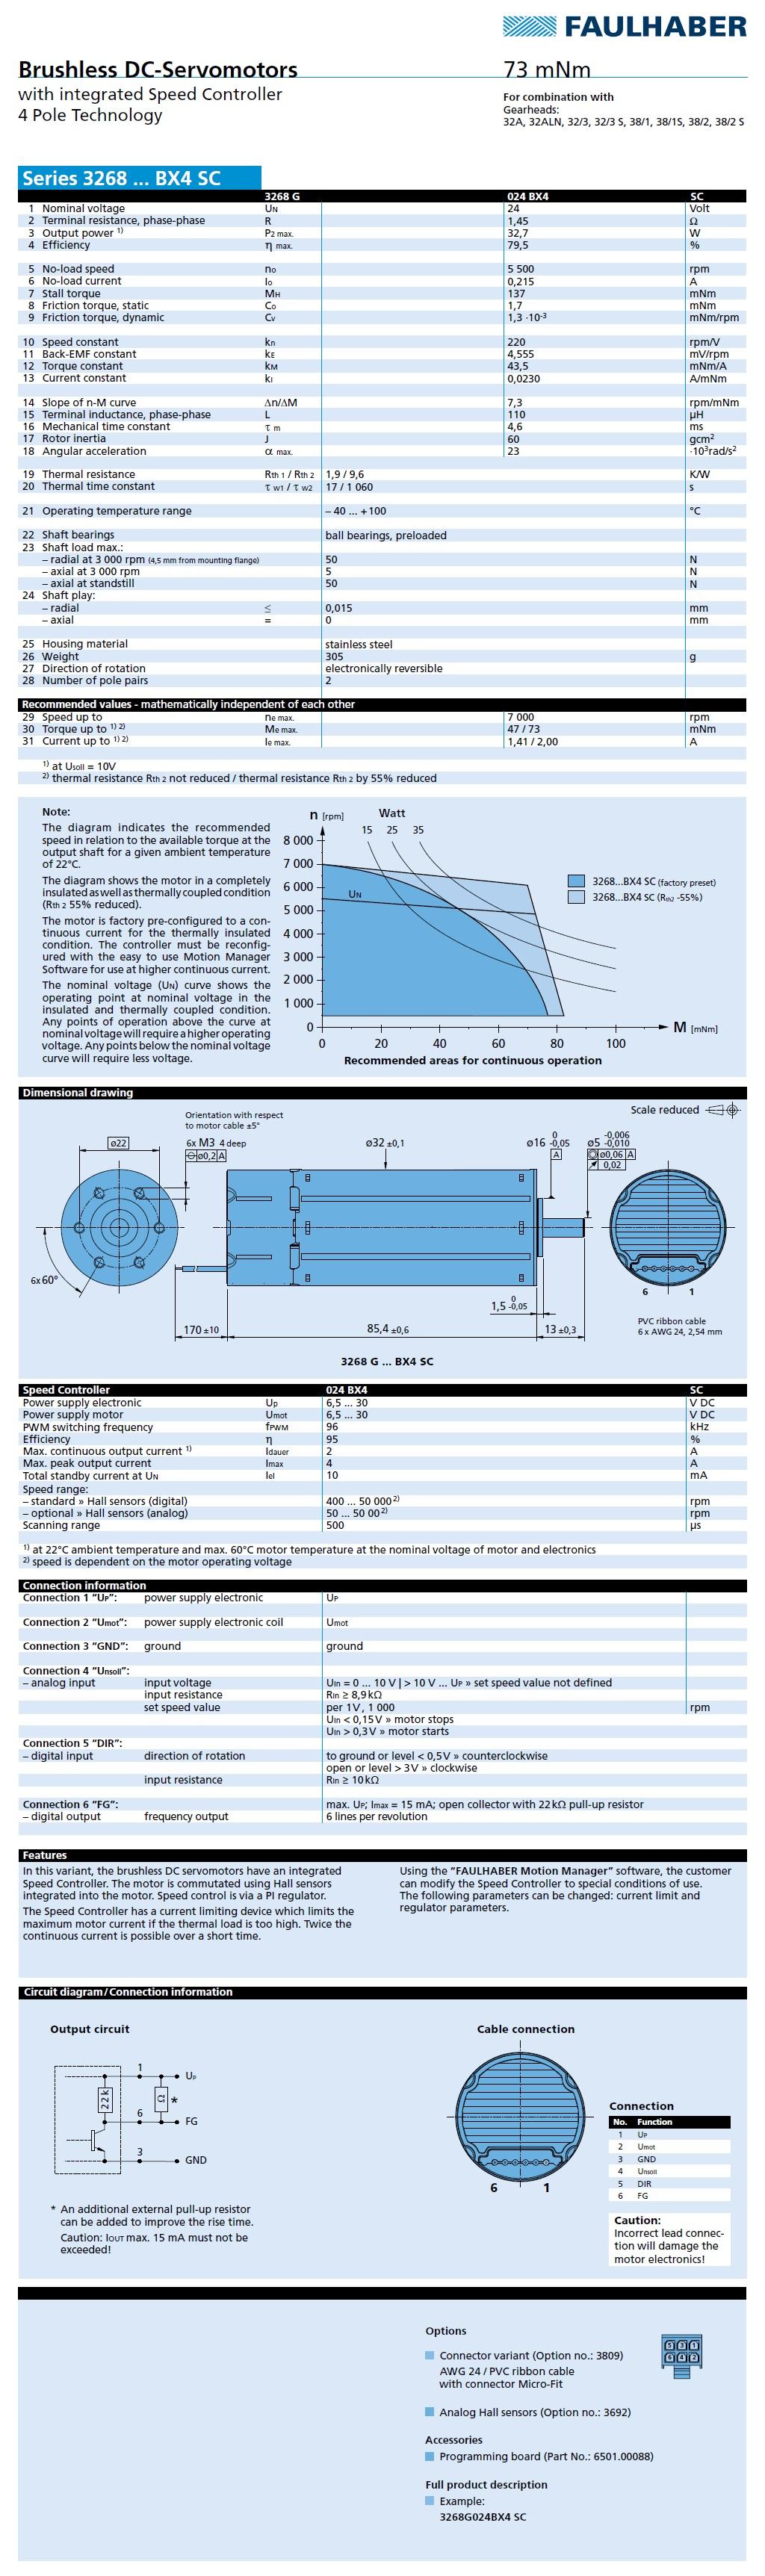 Faulhaber: Brushless DC-Servomotors (3268...BX4 SC Series)